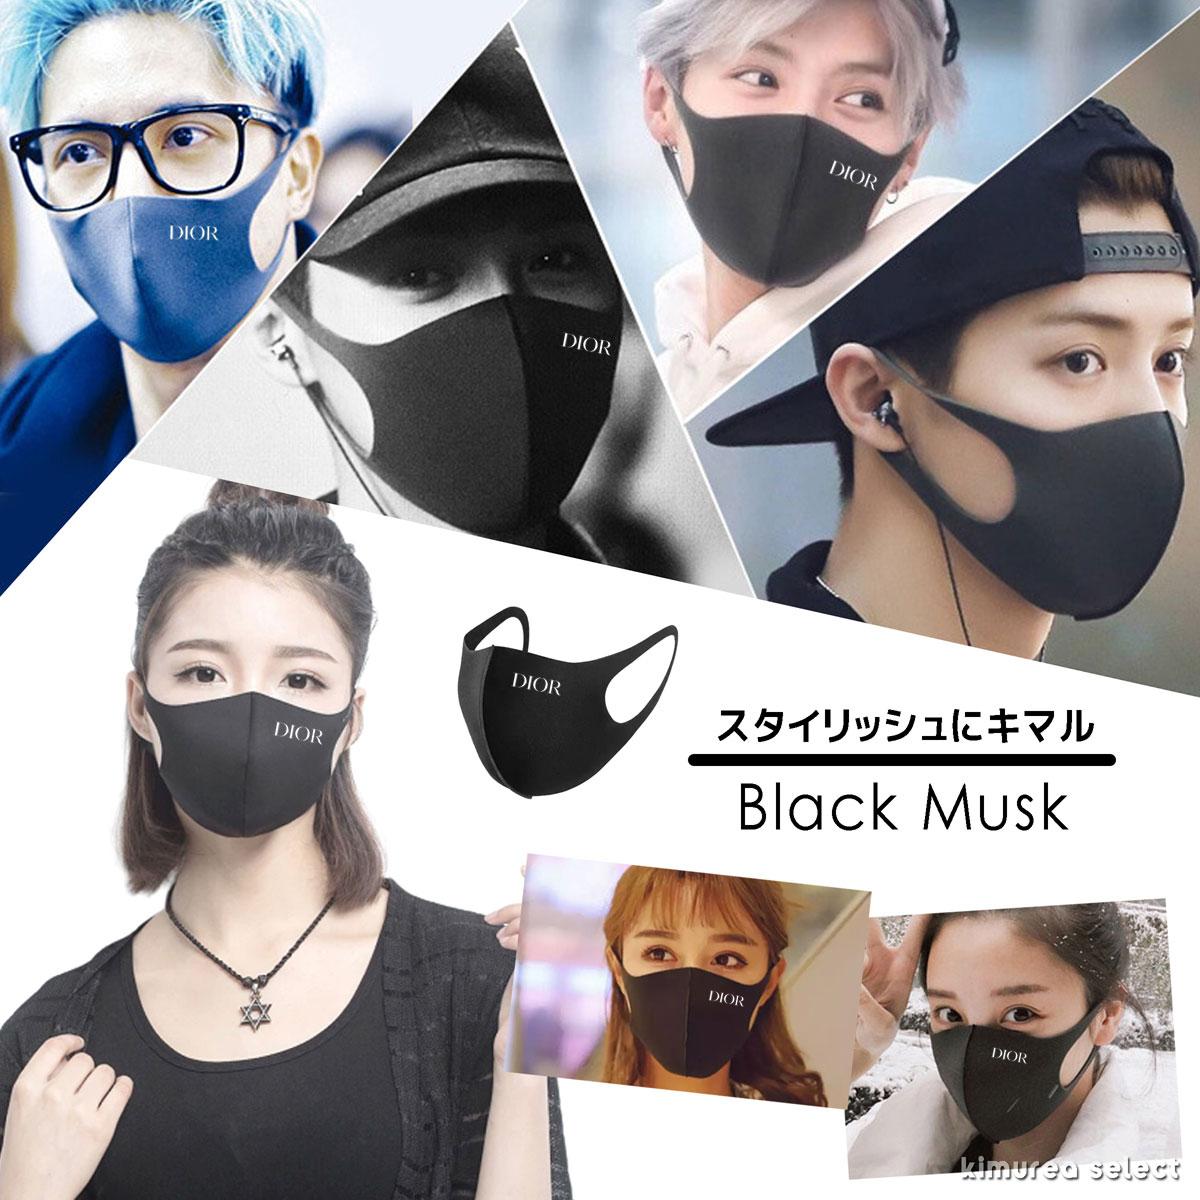 windproof dustproof comfortable dior masks for adults kids